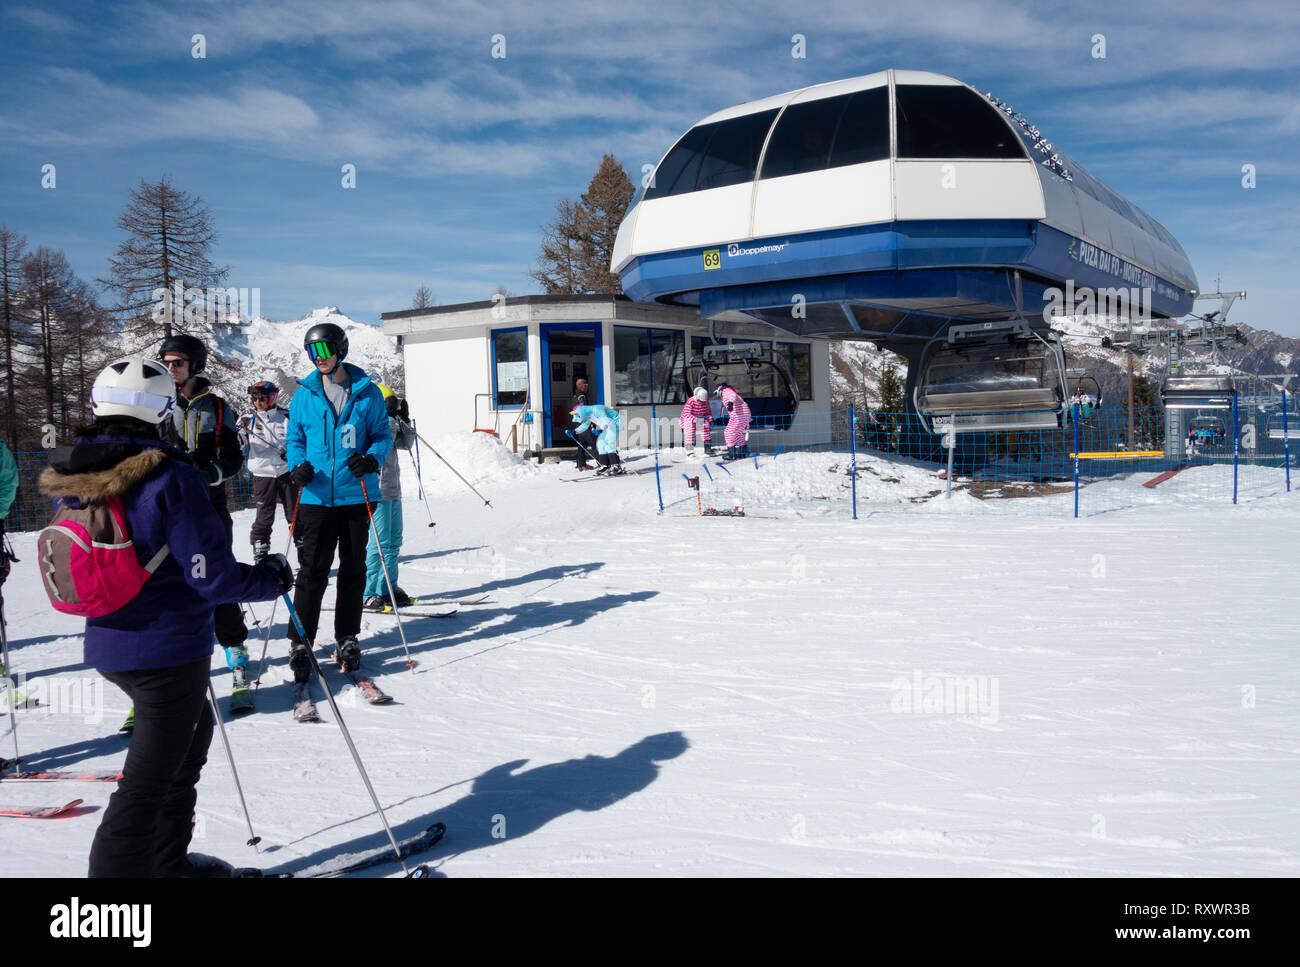 Italy skiing - Skiers at the skilift between Malga Grual and Dos Del Sabion, Brenta Dolomites, Madonna di Campiglio, northern Italy Europe - Stock Image